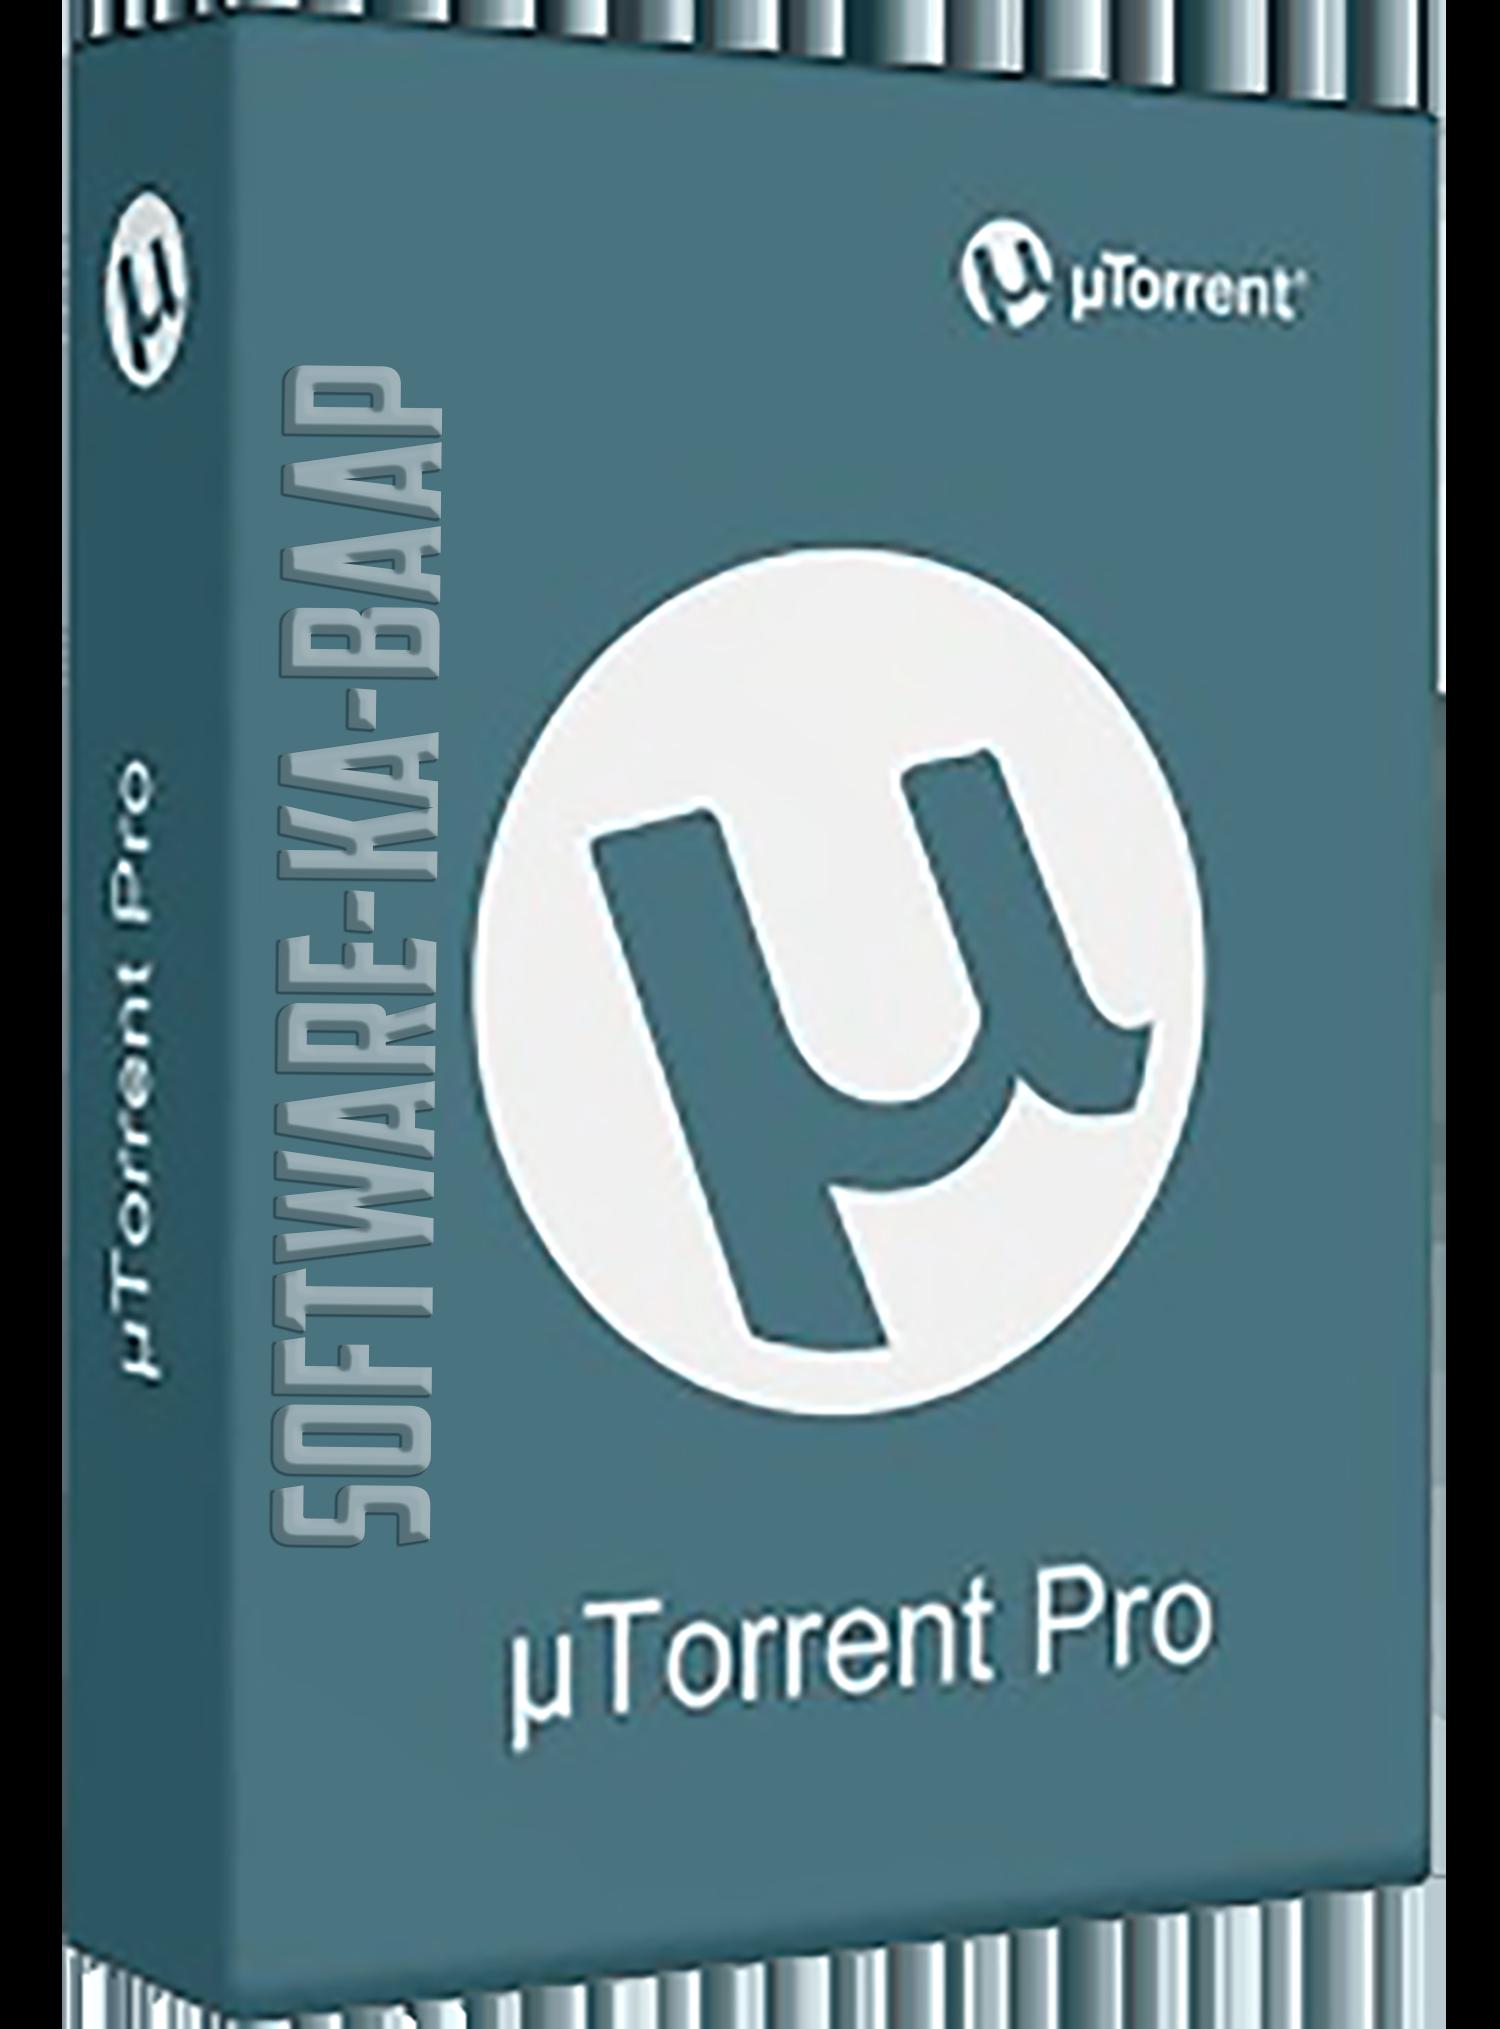 utorrent pro free download for pc windows 7